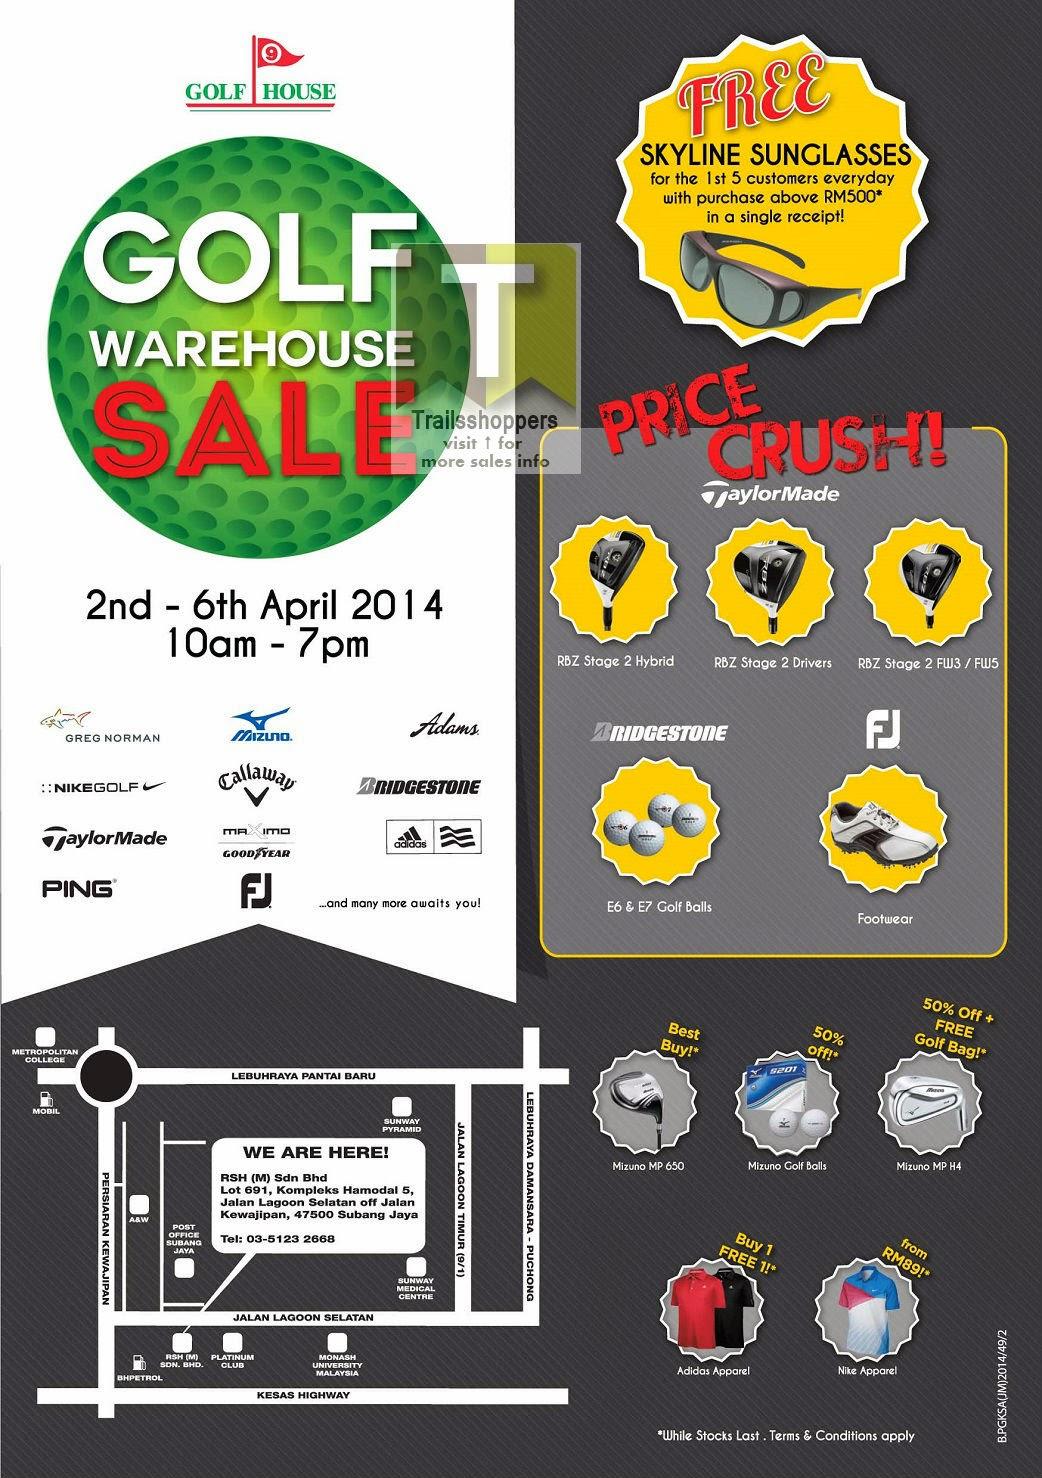 RSH Golf House Warehouse Sale Kompleks Hamodal Lagoon Selatan Subang Jaya